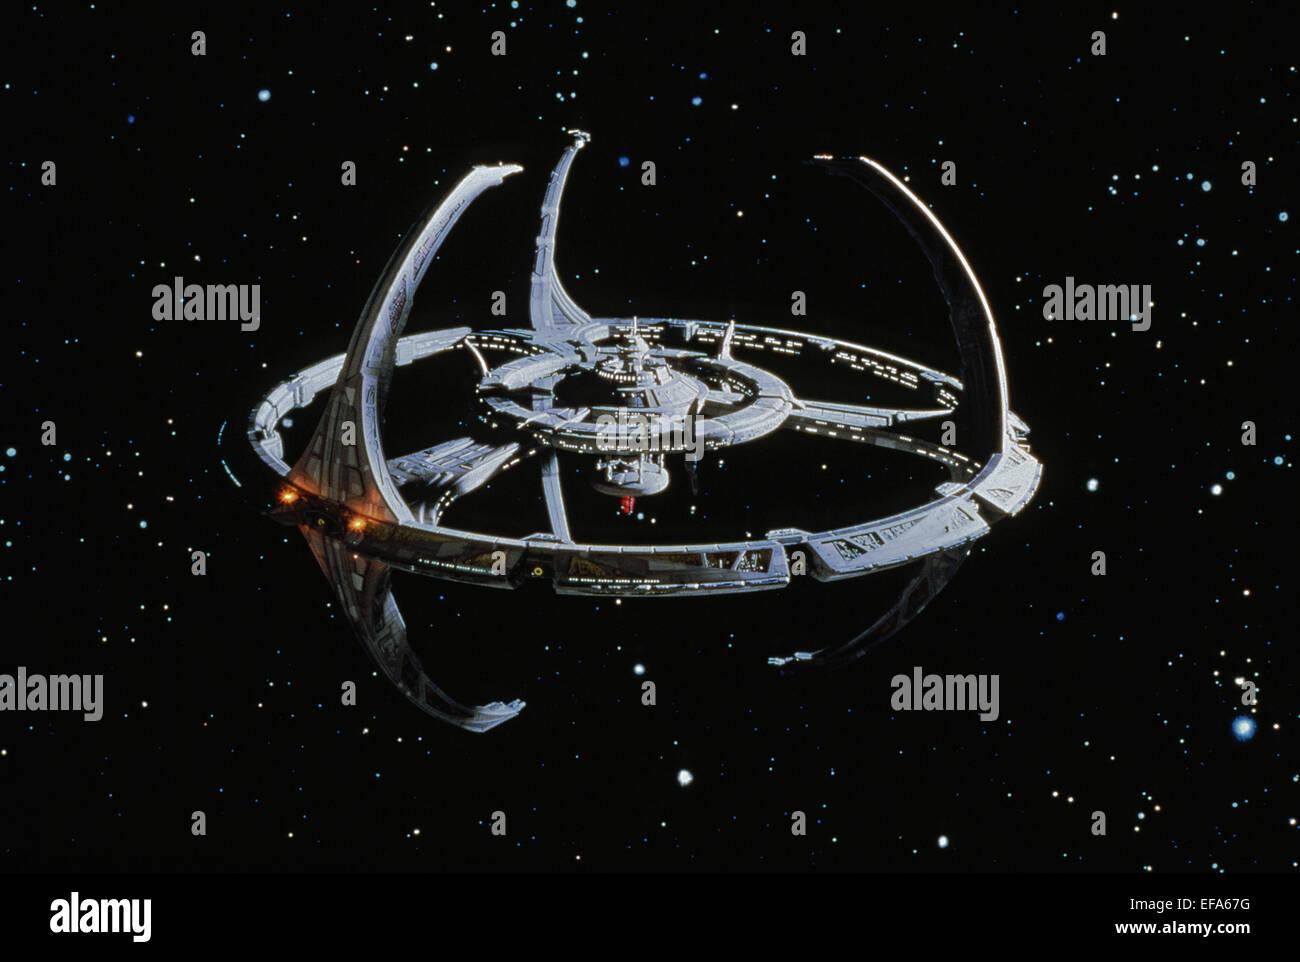 SPACE STATION STAR TREK: DEEP SPACE NINE (1993) - Stock Image